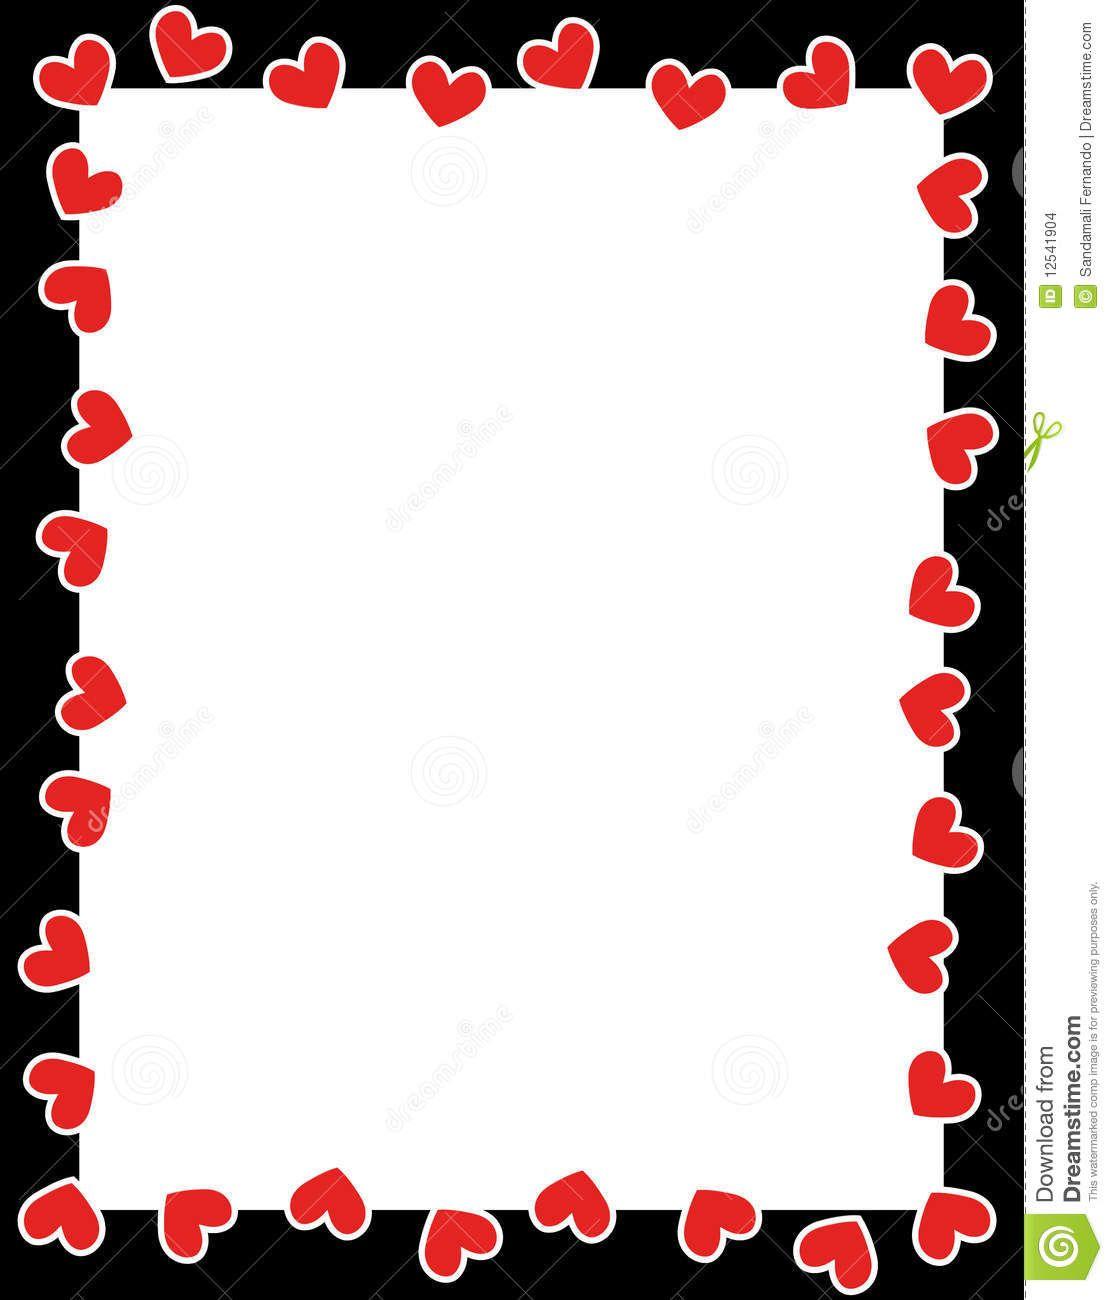 1113x1300 Valentines Day Clip Art Valentine's Day Clip Art Borders